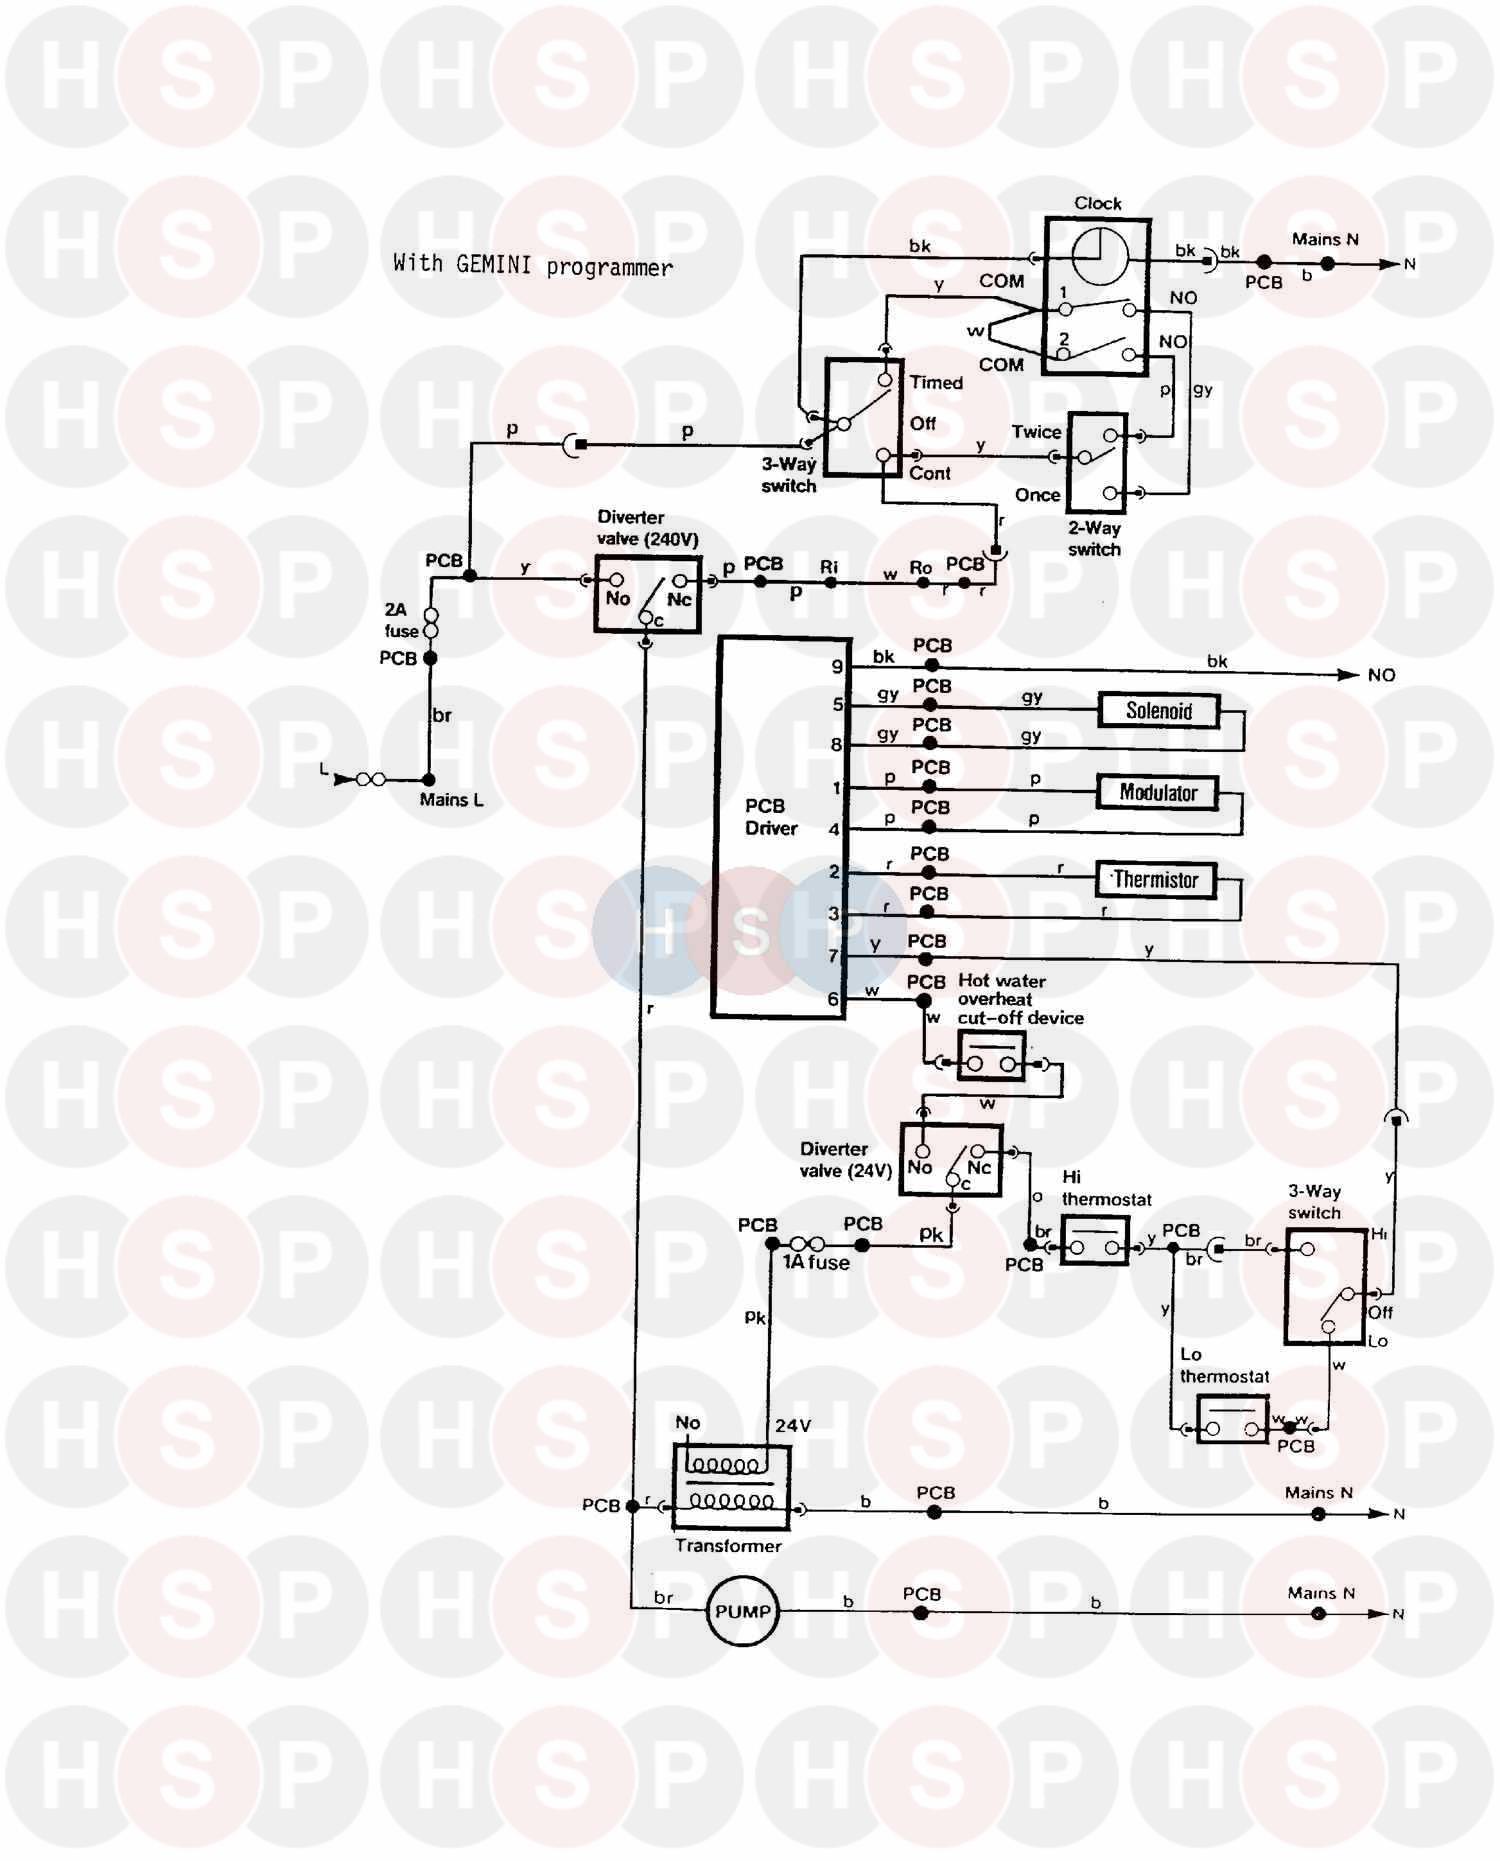 myson gemini 1988 wiring 1 diagram heating spare parts. Black Bedroom Furniture Sets. Home Design Ideas